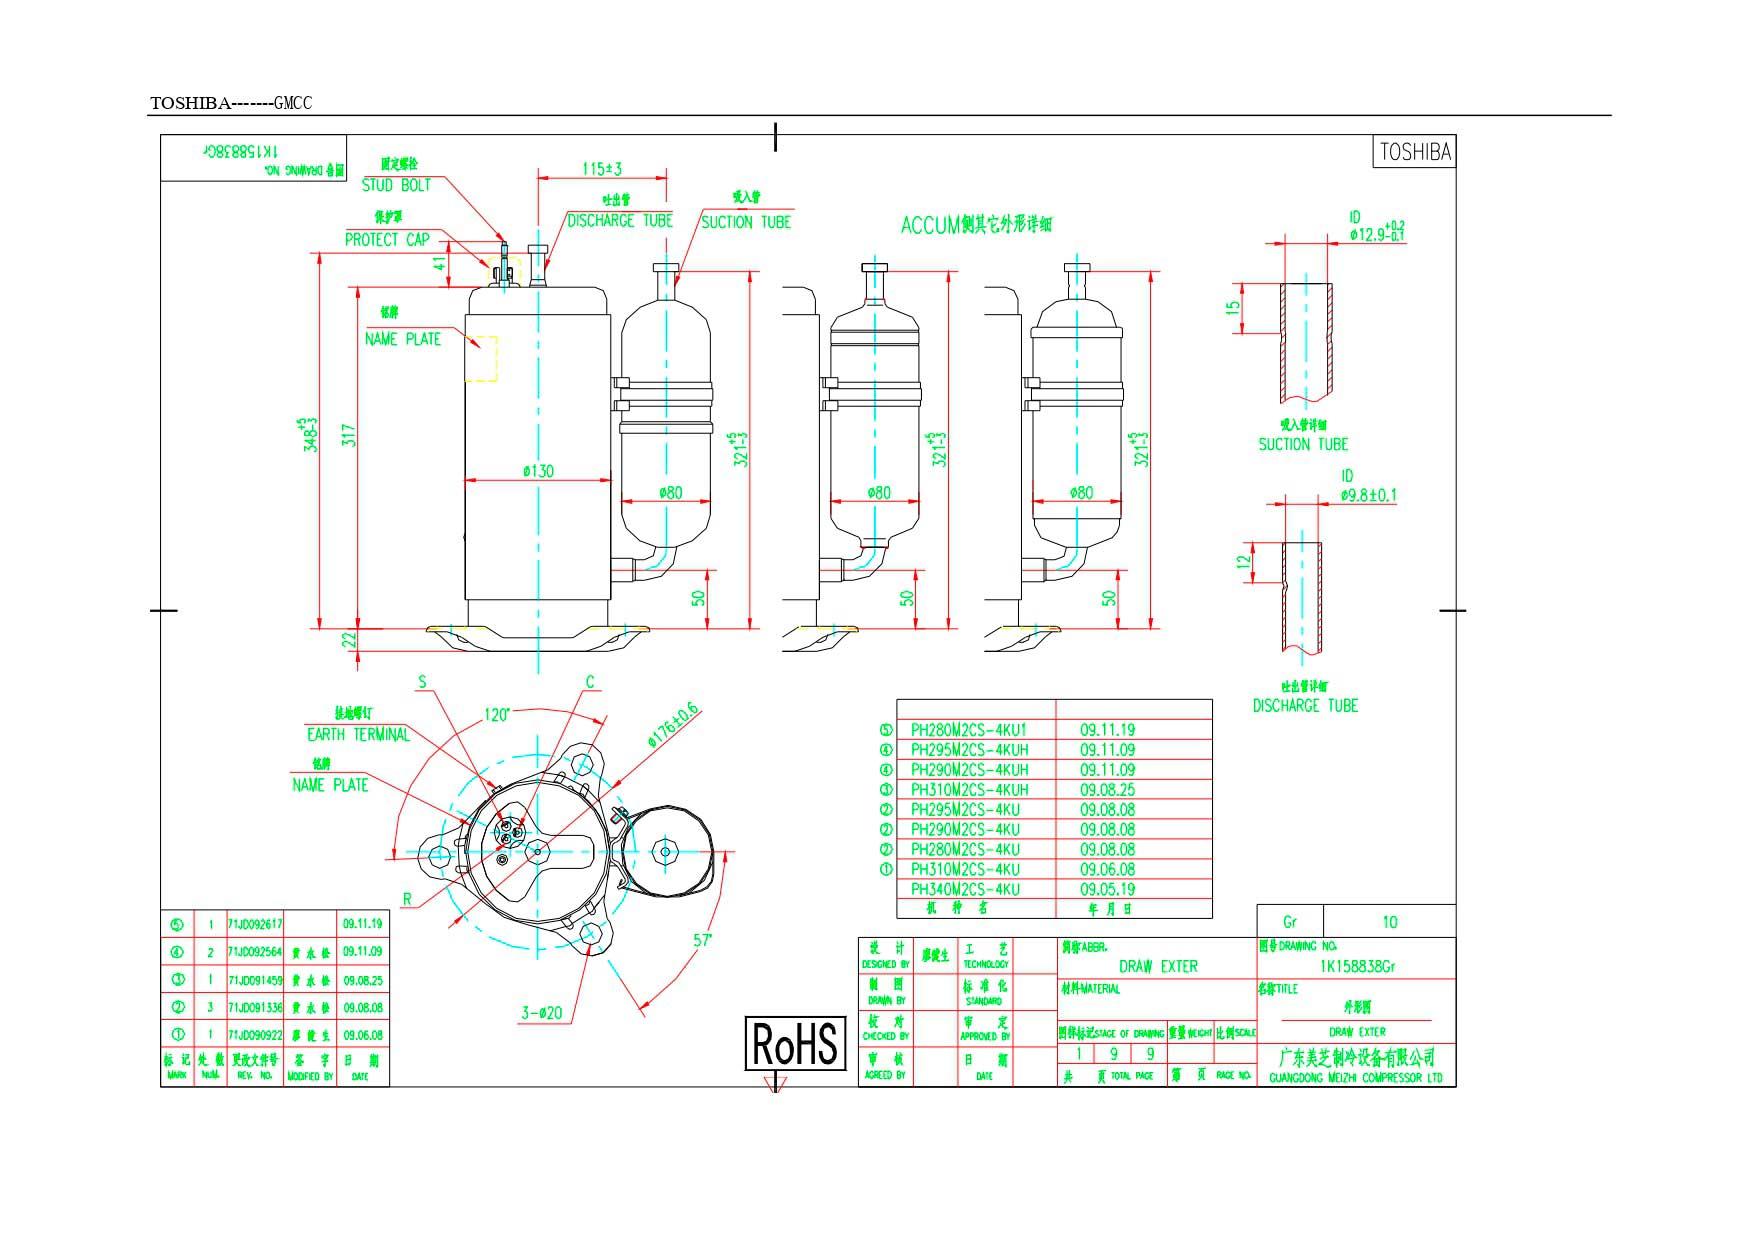 GMCC PH340X2CS-4KU2 характеристики